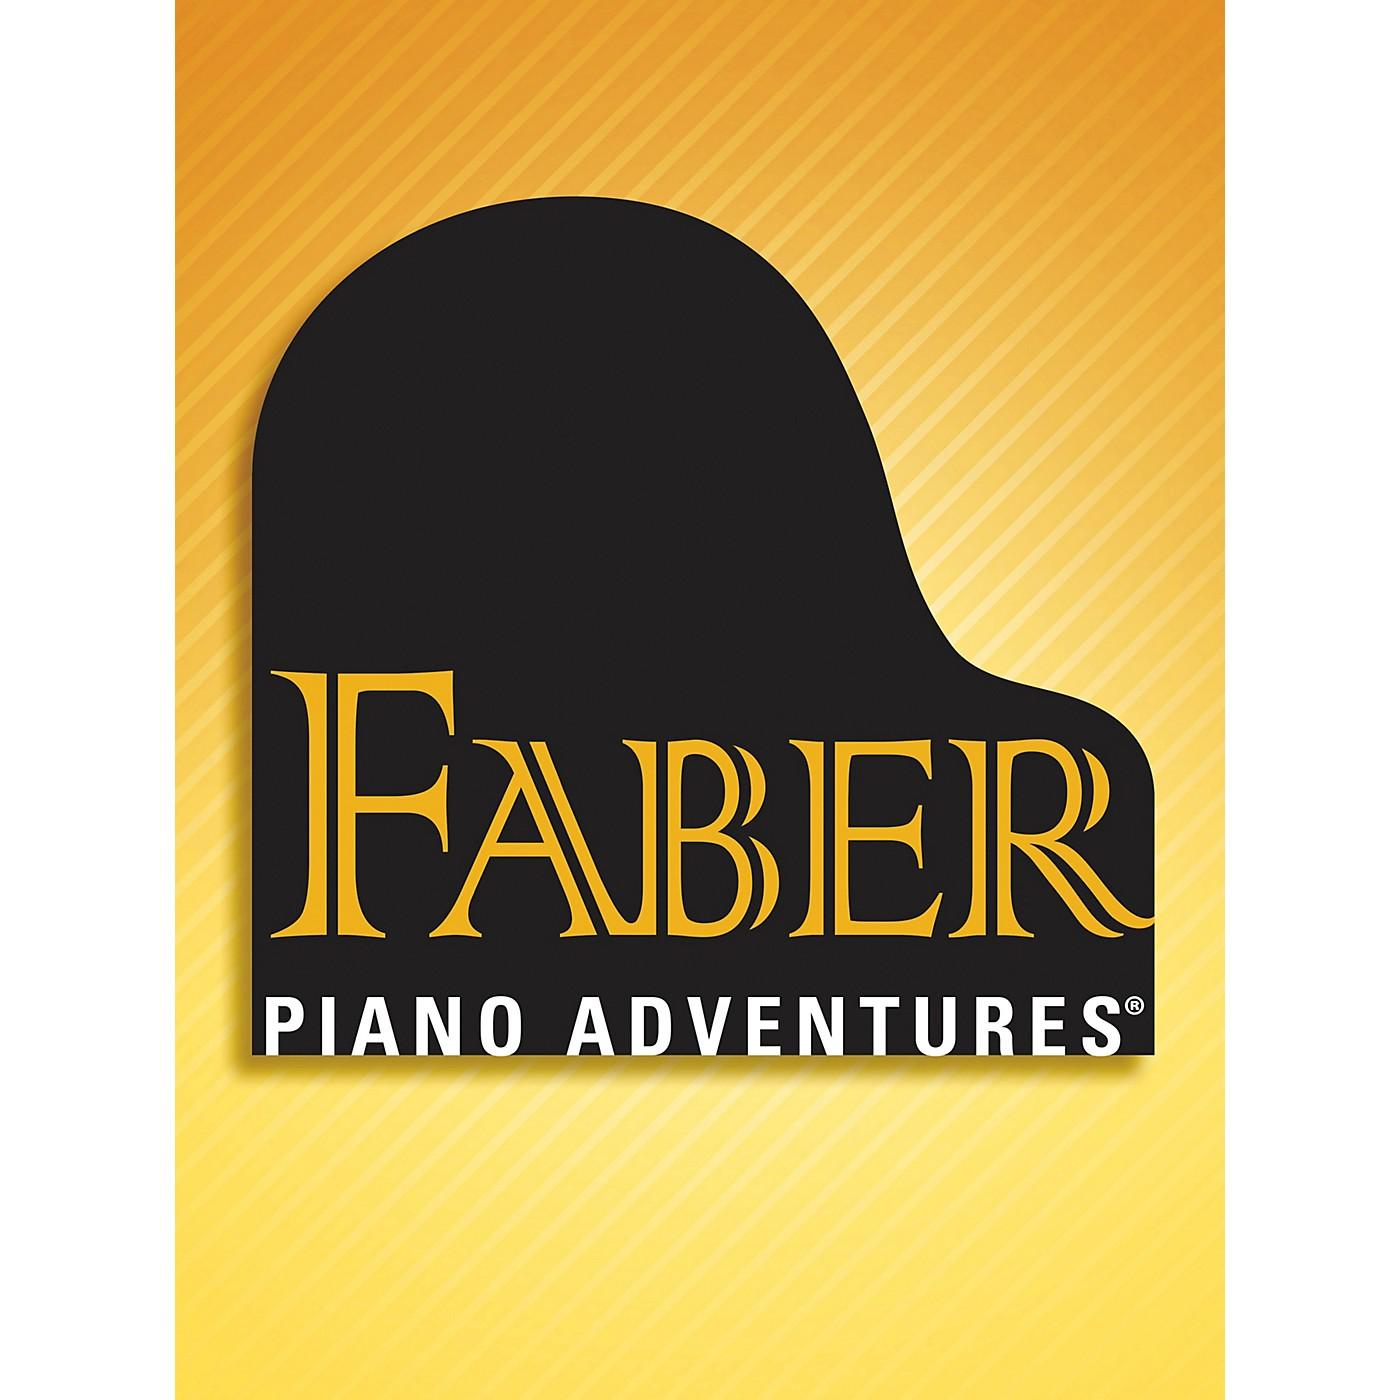 Faber Piano Adventures ChordTime® Classics (Level 2B) Faber Piano Adventures® Series Disk thumbnail